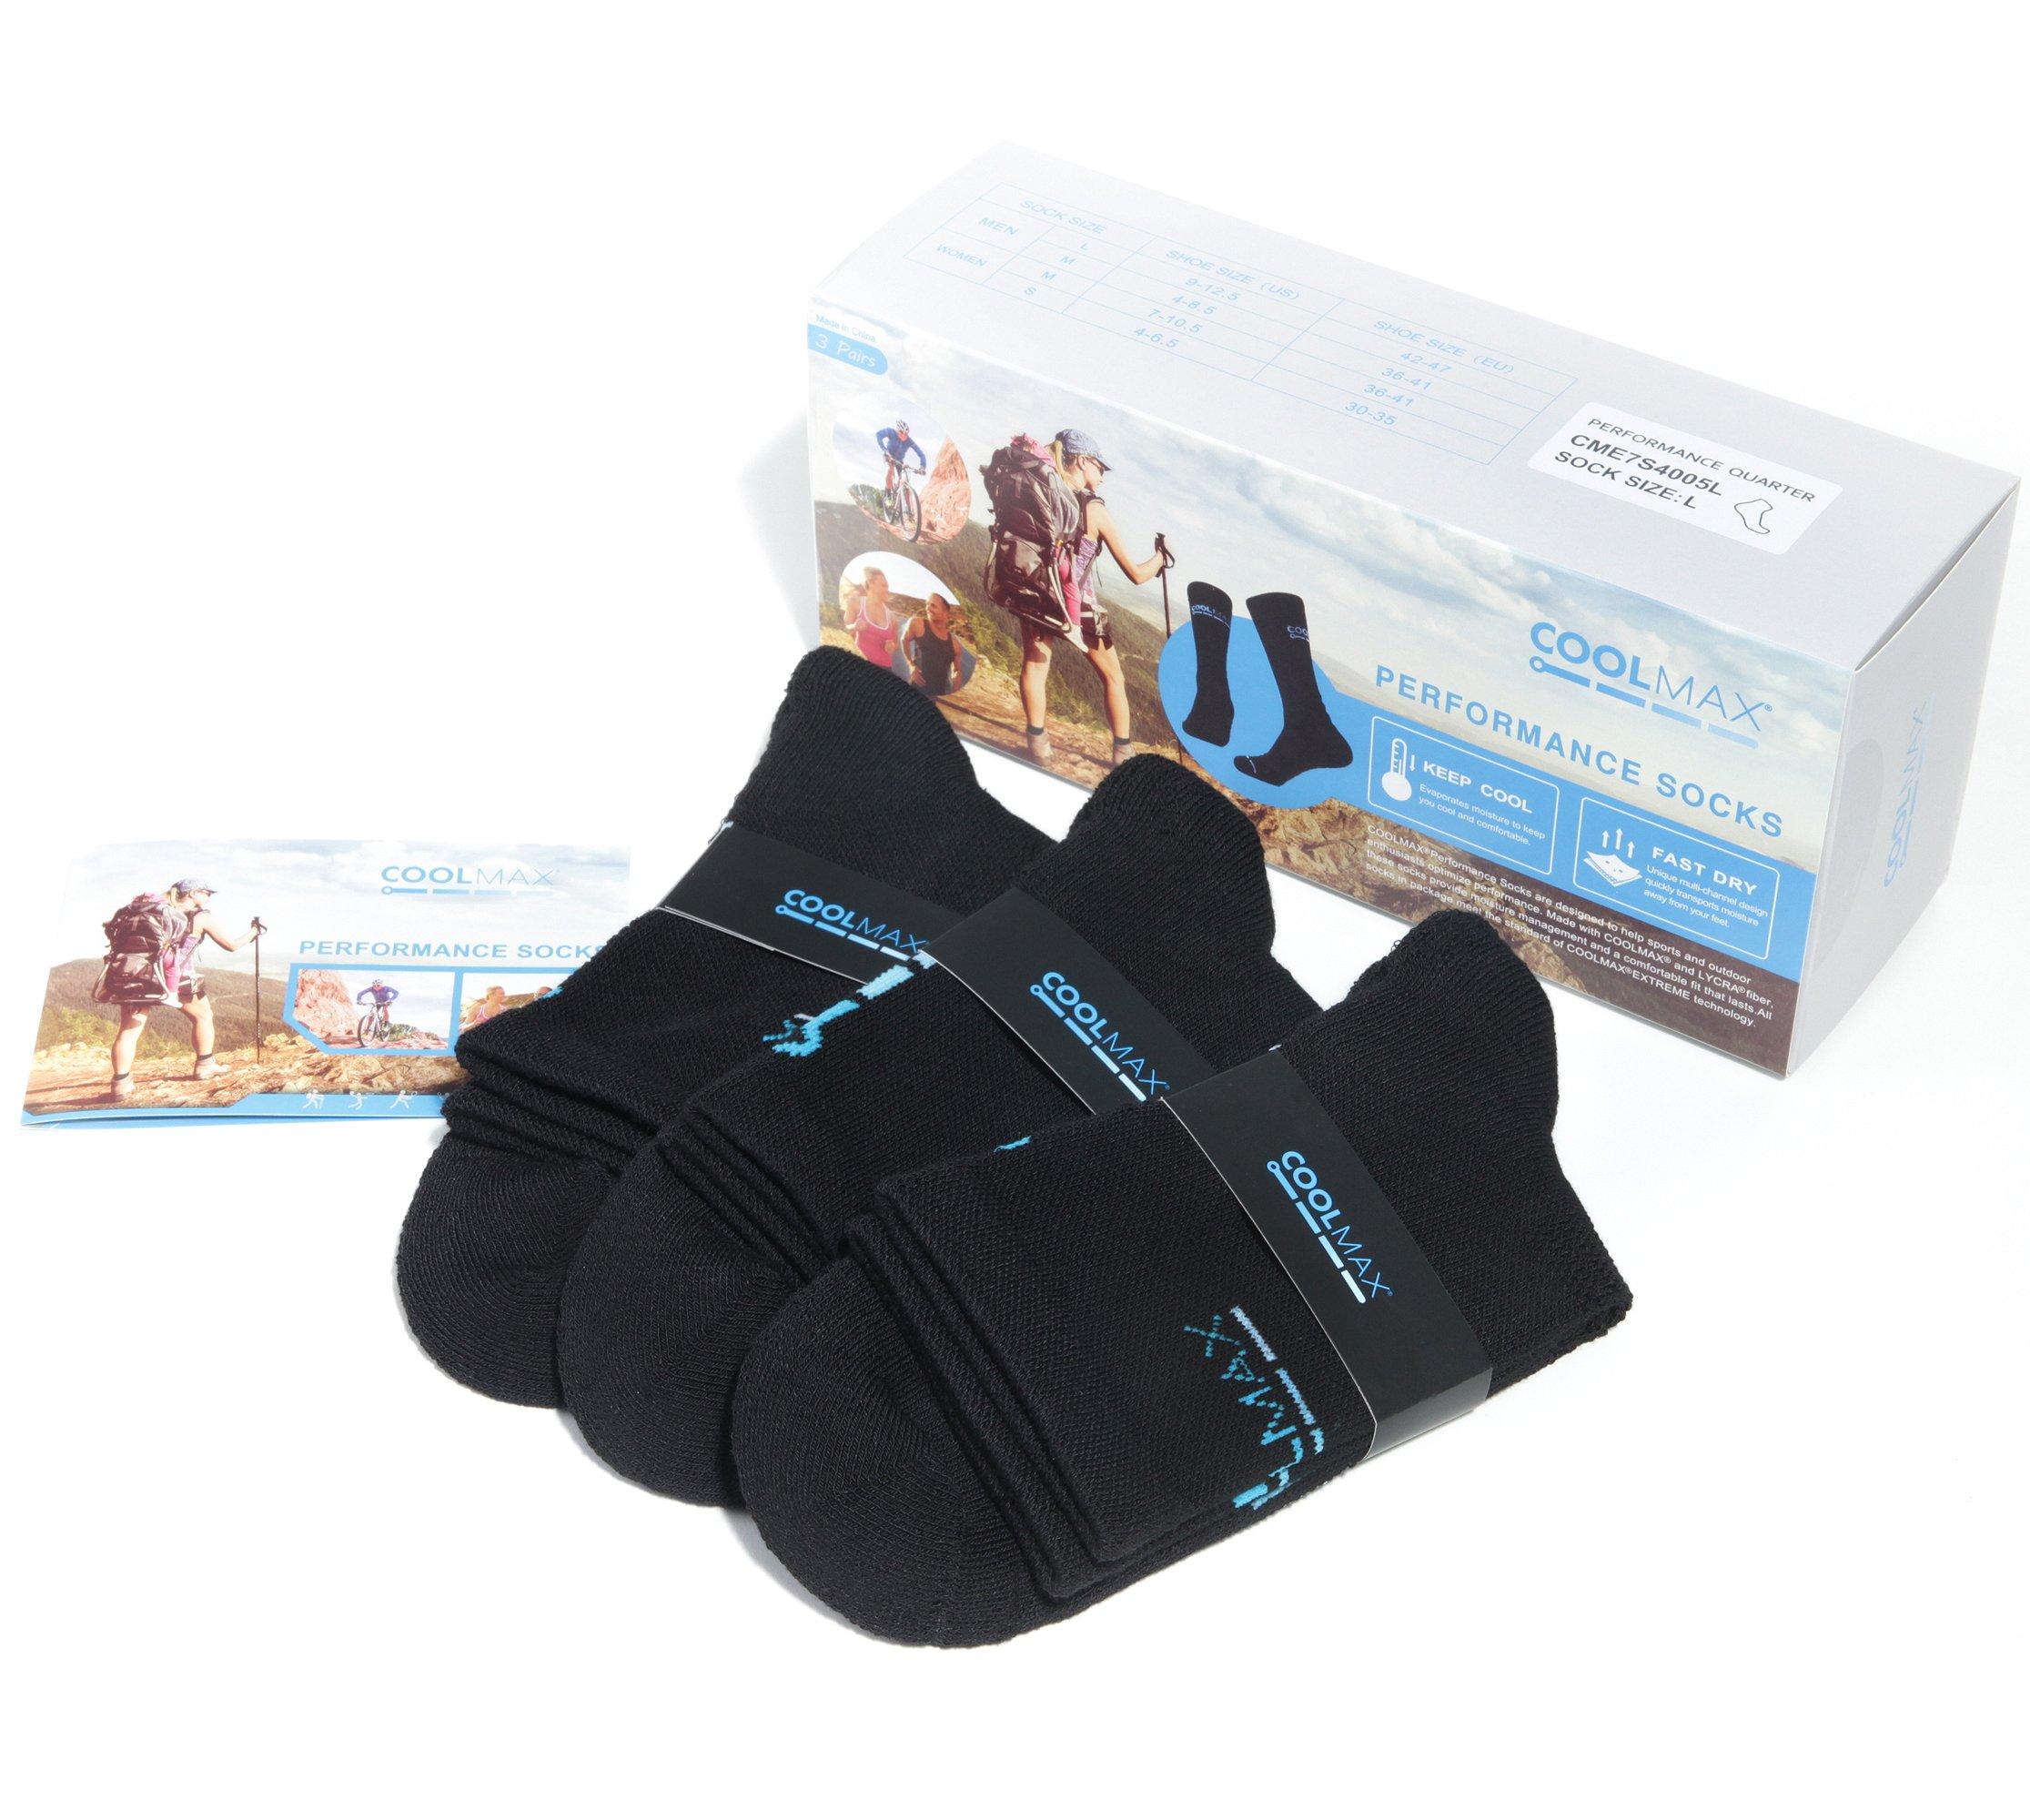 COOLMAX Brand 3 Pack High Performance Athletic Quarter Cushion Socks for Mens Womens (L size)